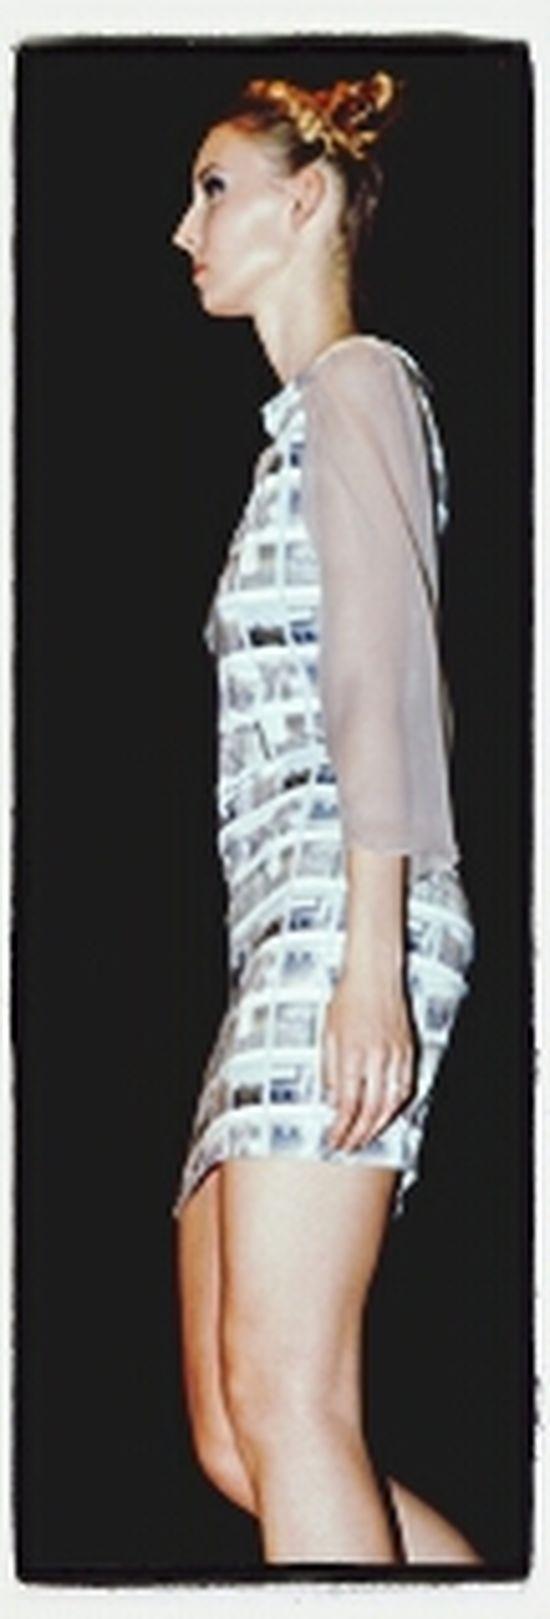 Polaroid dress Fashion Degree Show Inspiredbyhockney Designedbyme #handmade #designedmyownfabric